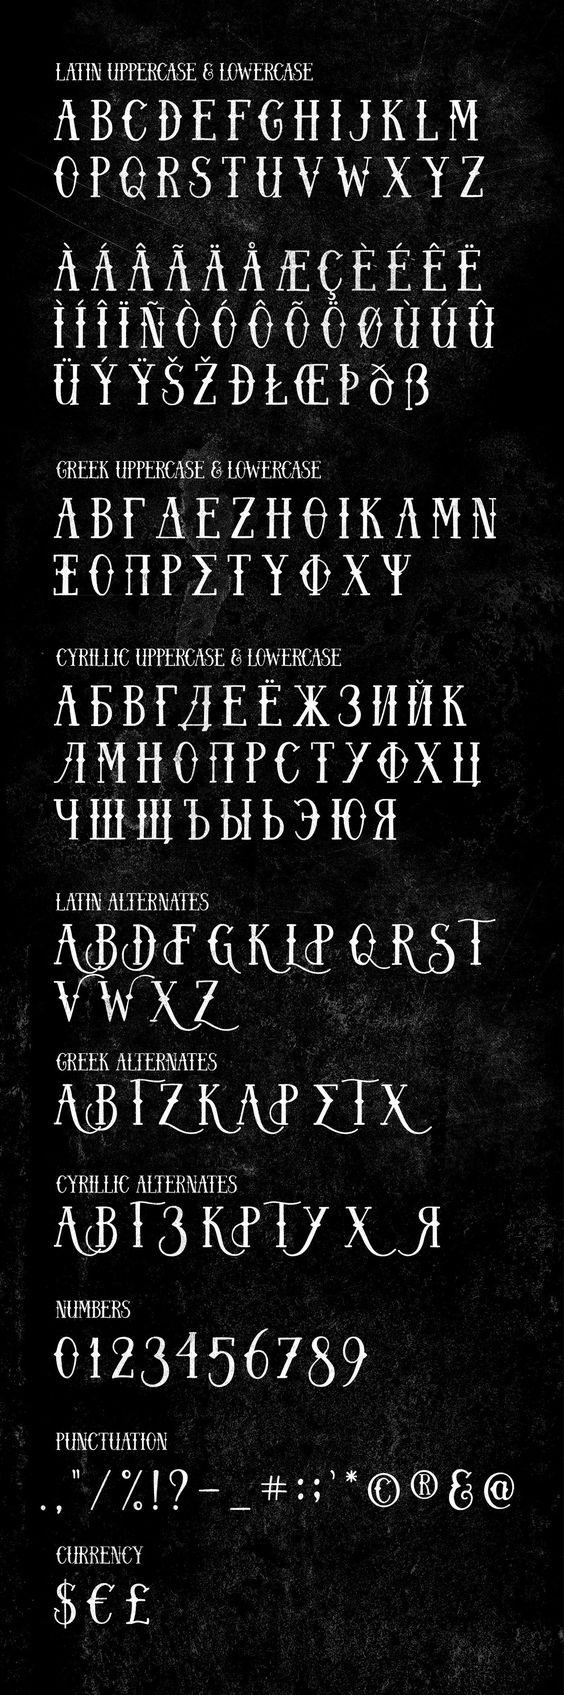 Charming – Free Hand Drawn Font Poster B